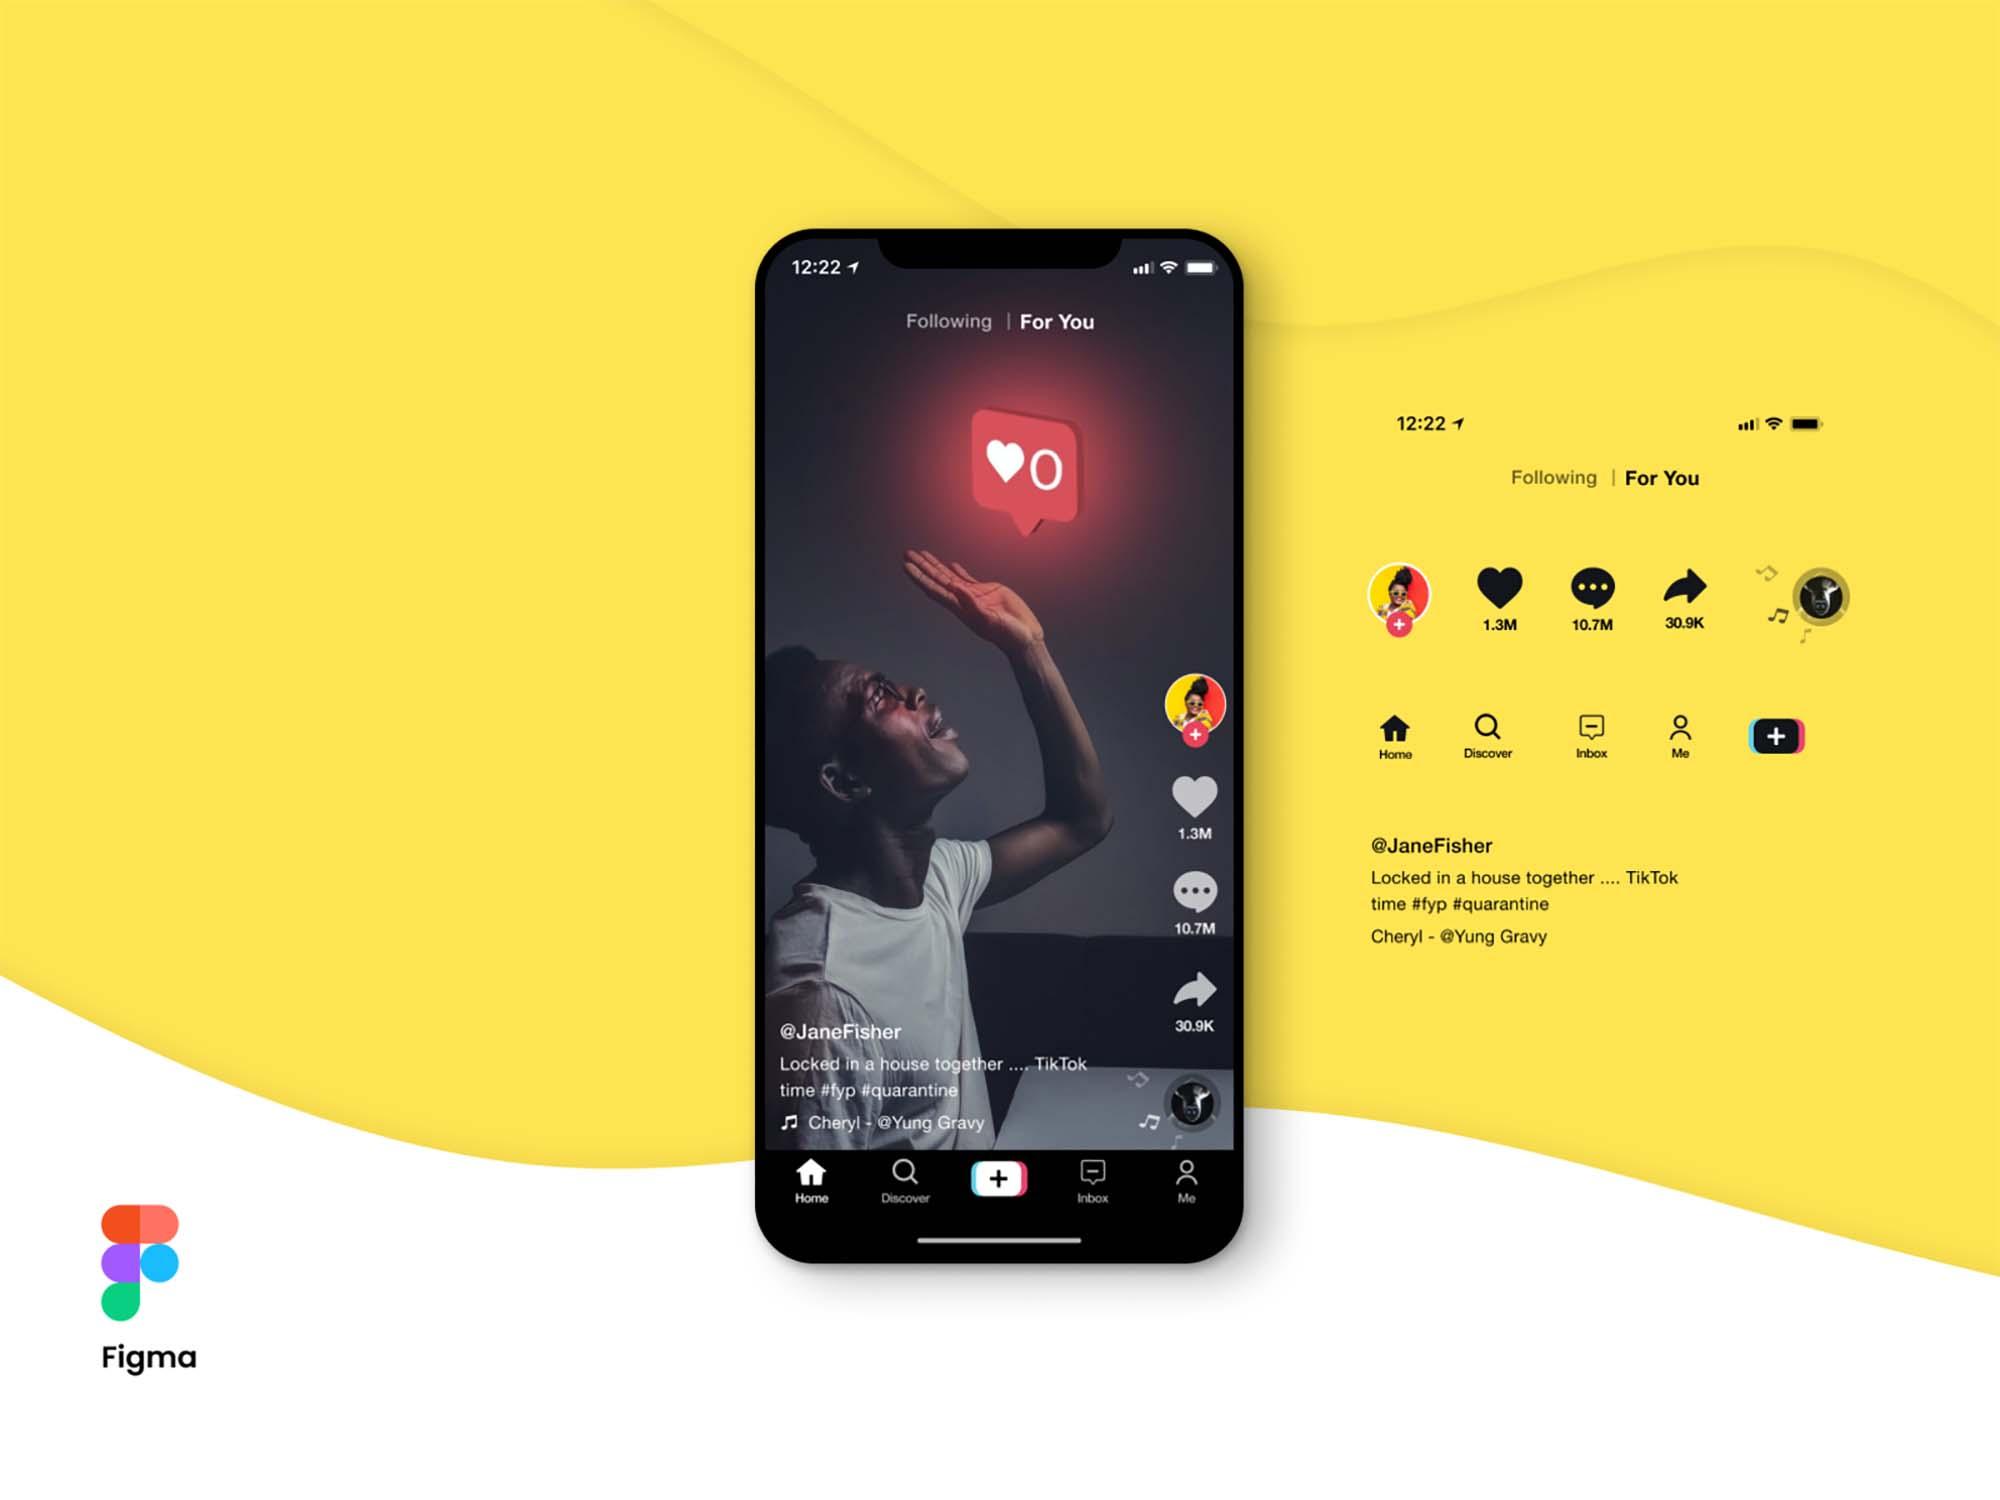 TikTok Screen UI Mockup